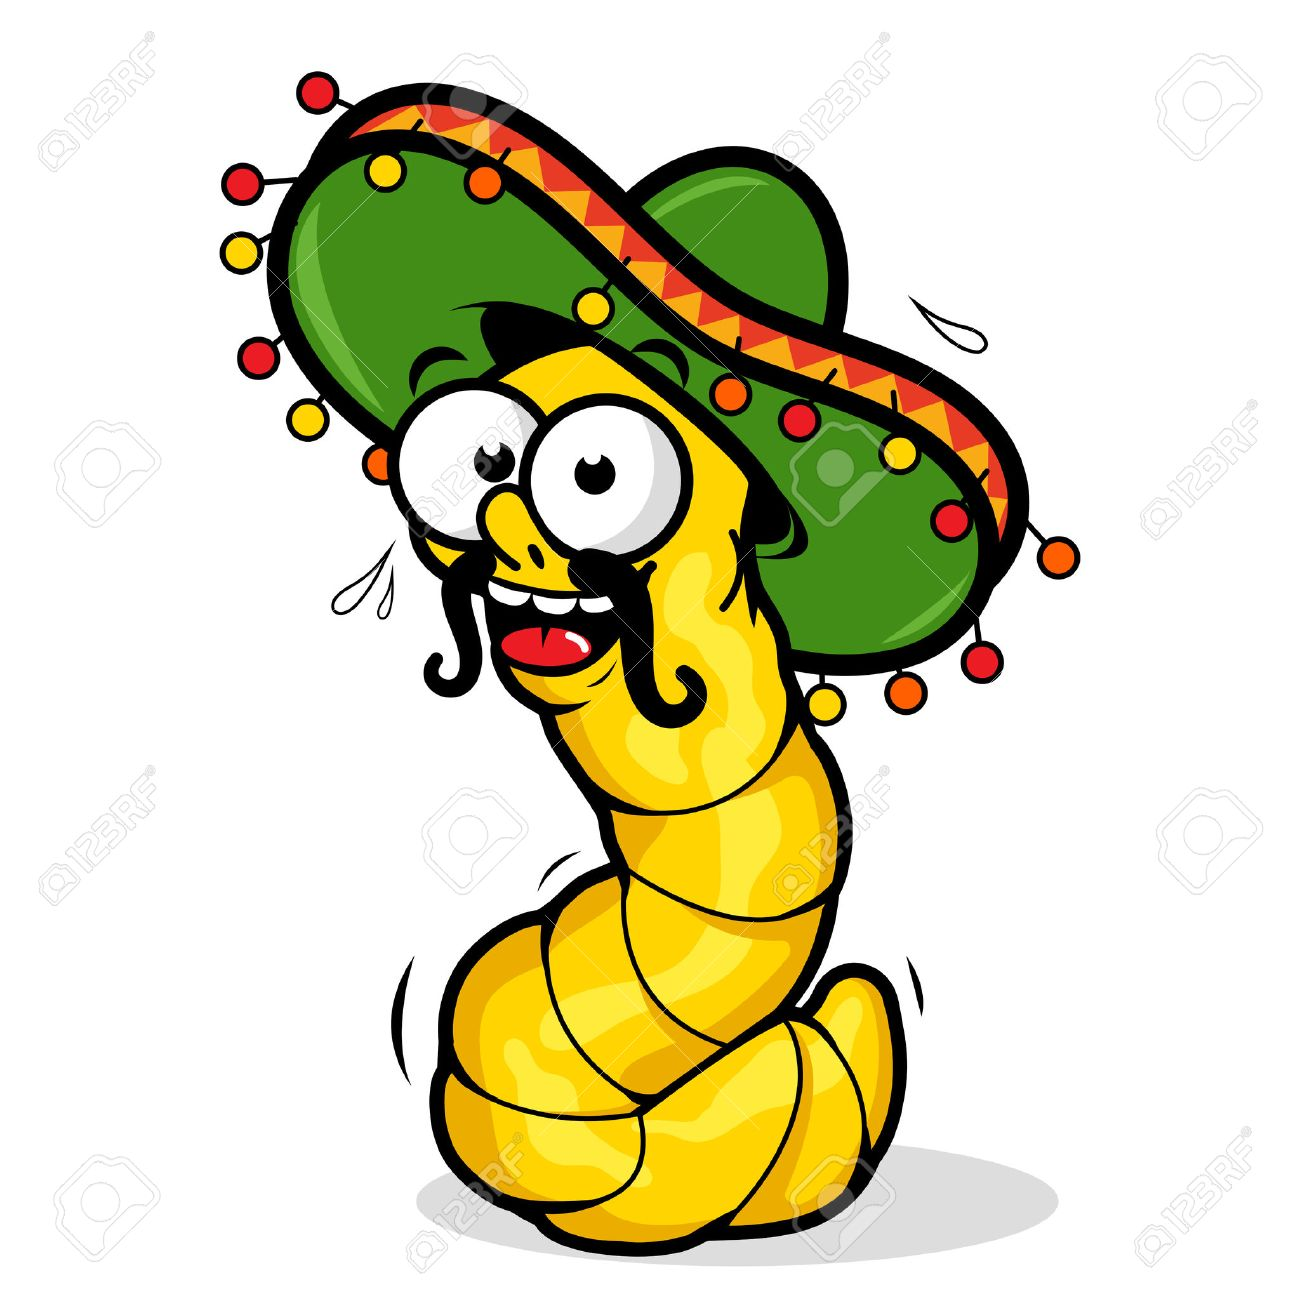 Cartoon tequila worm wearing a sombrero. - 46750474